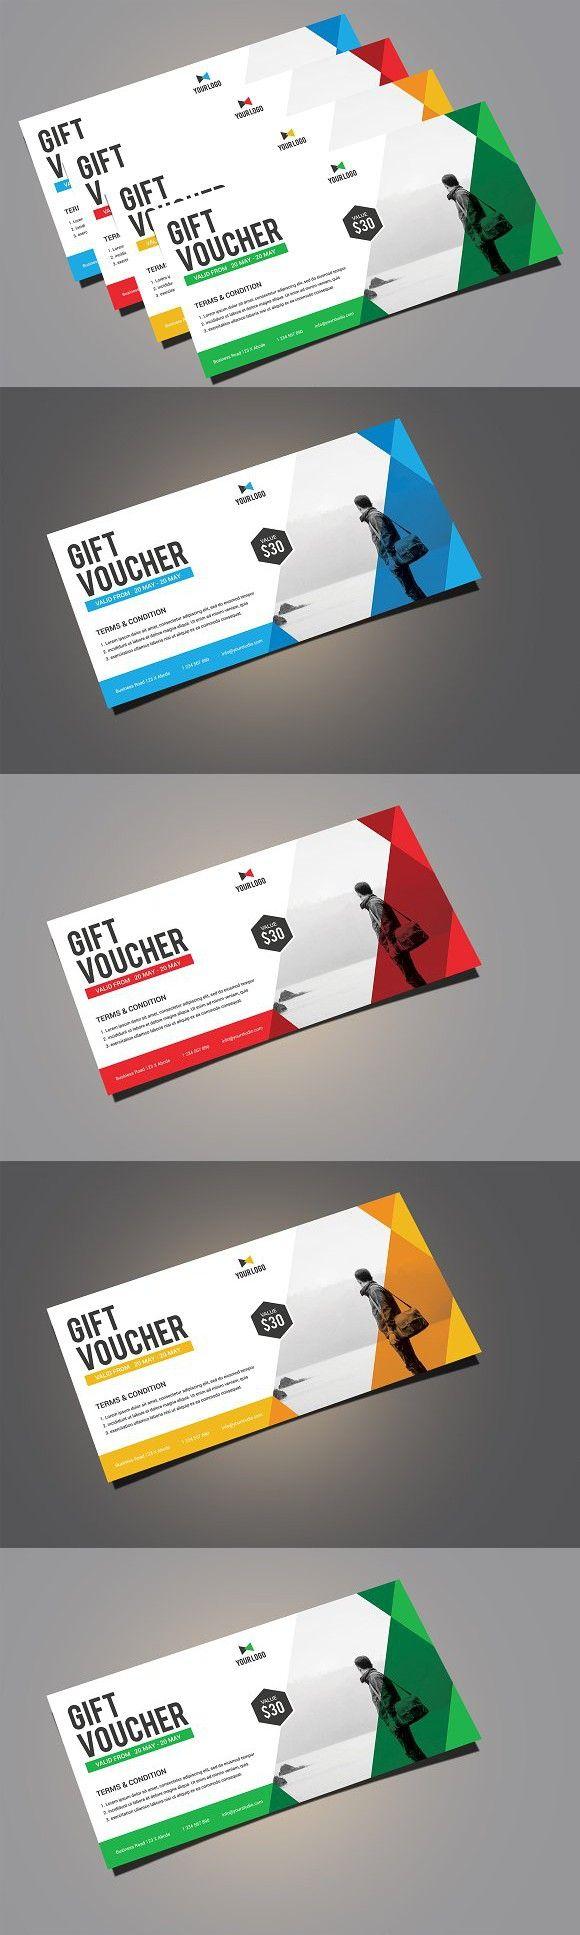 Gift Voucher. Creative Card Templates